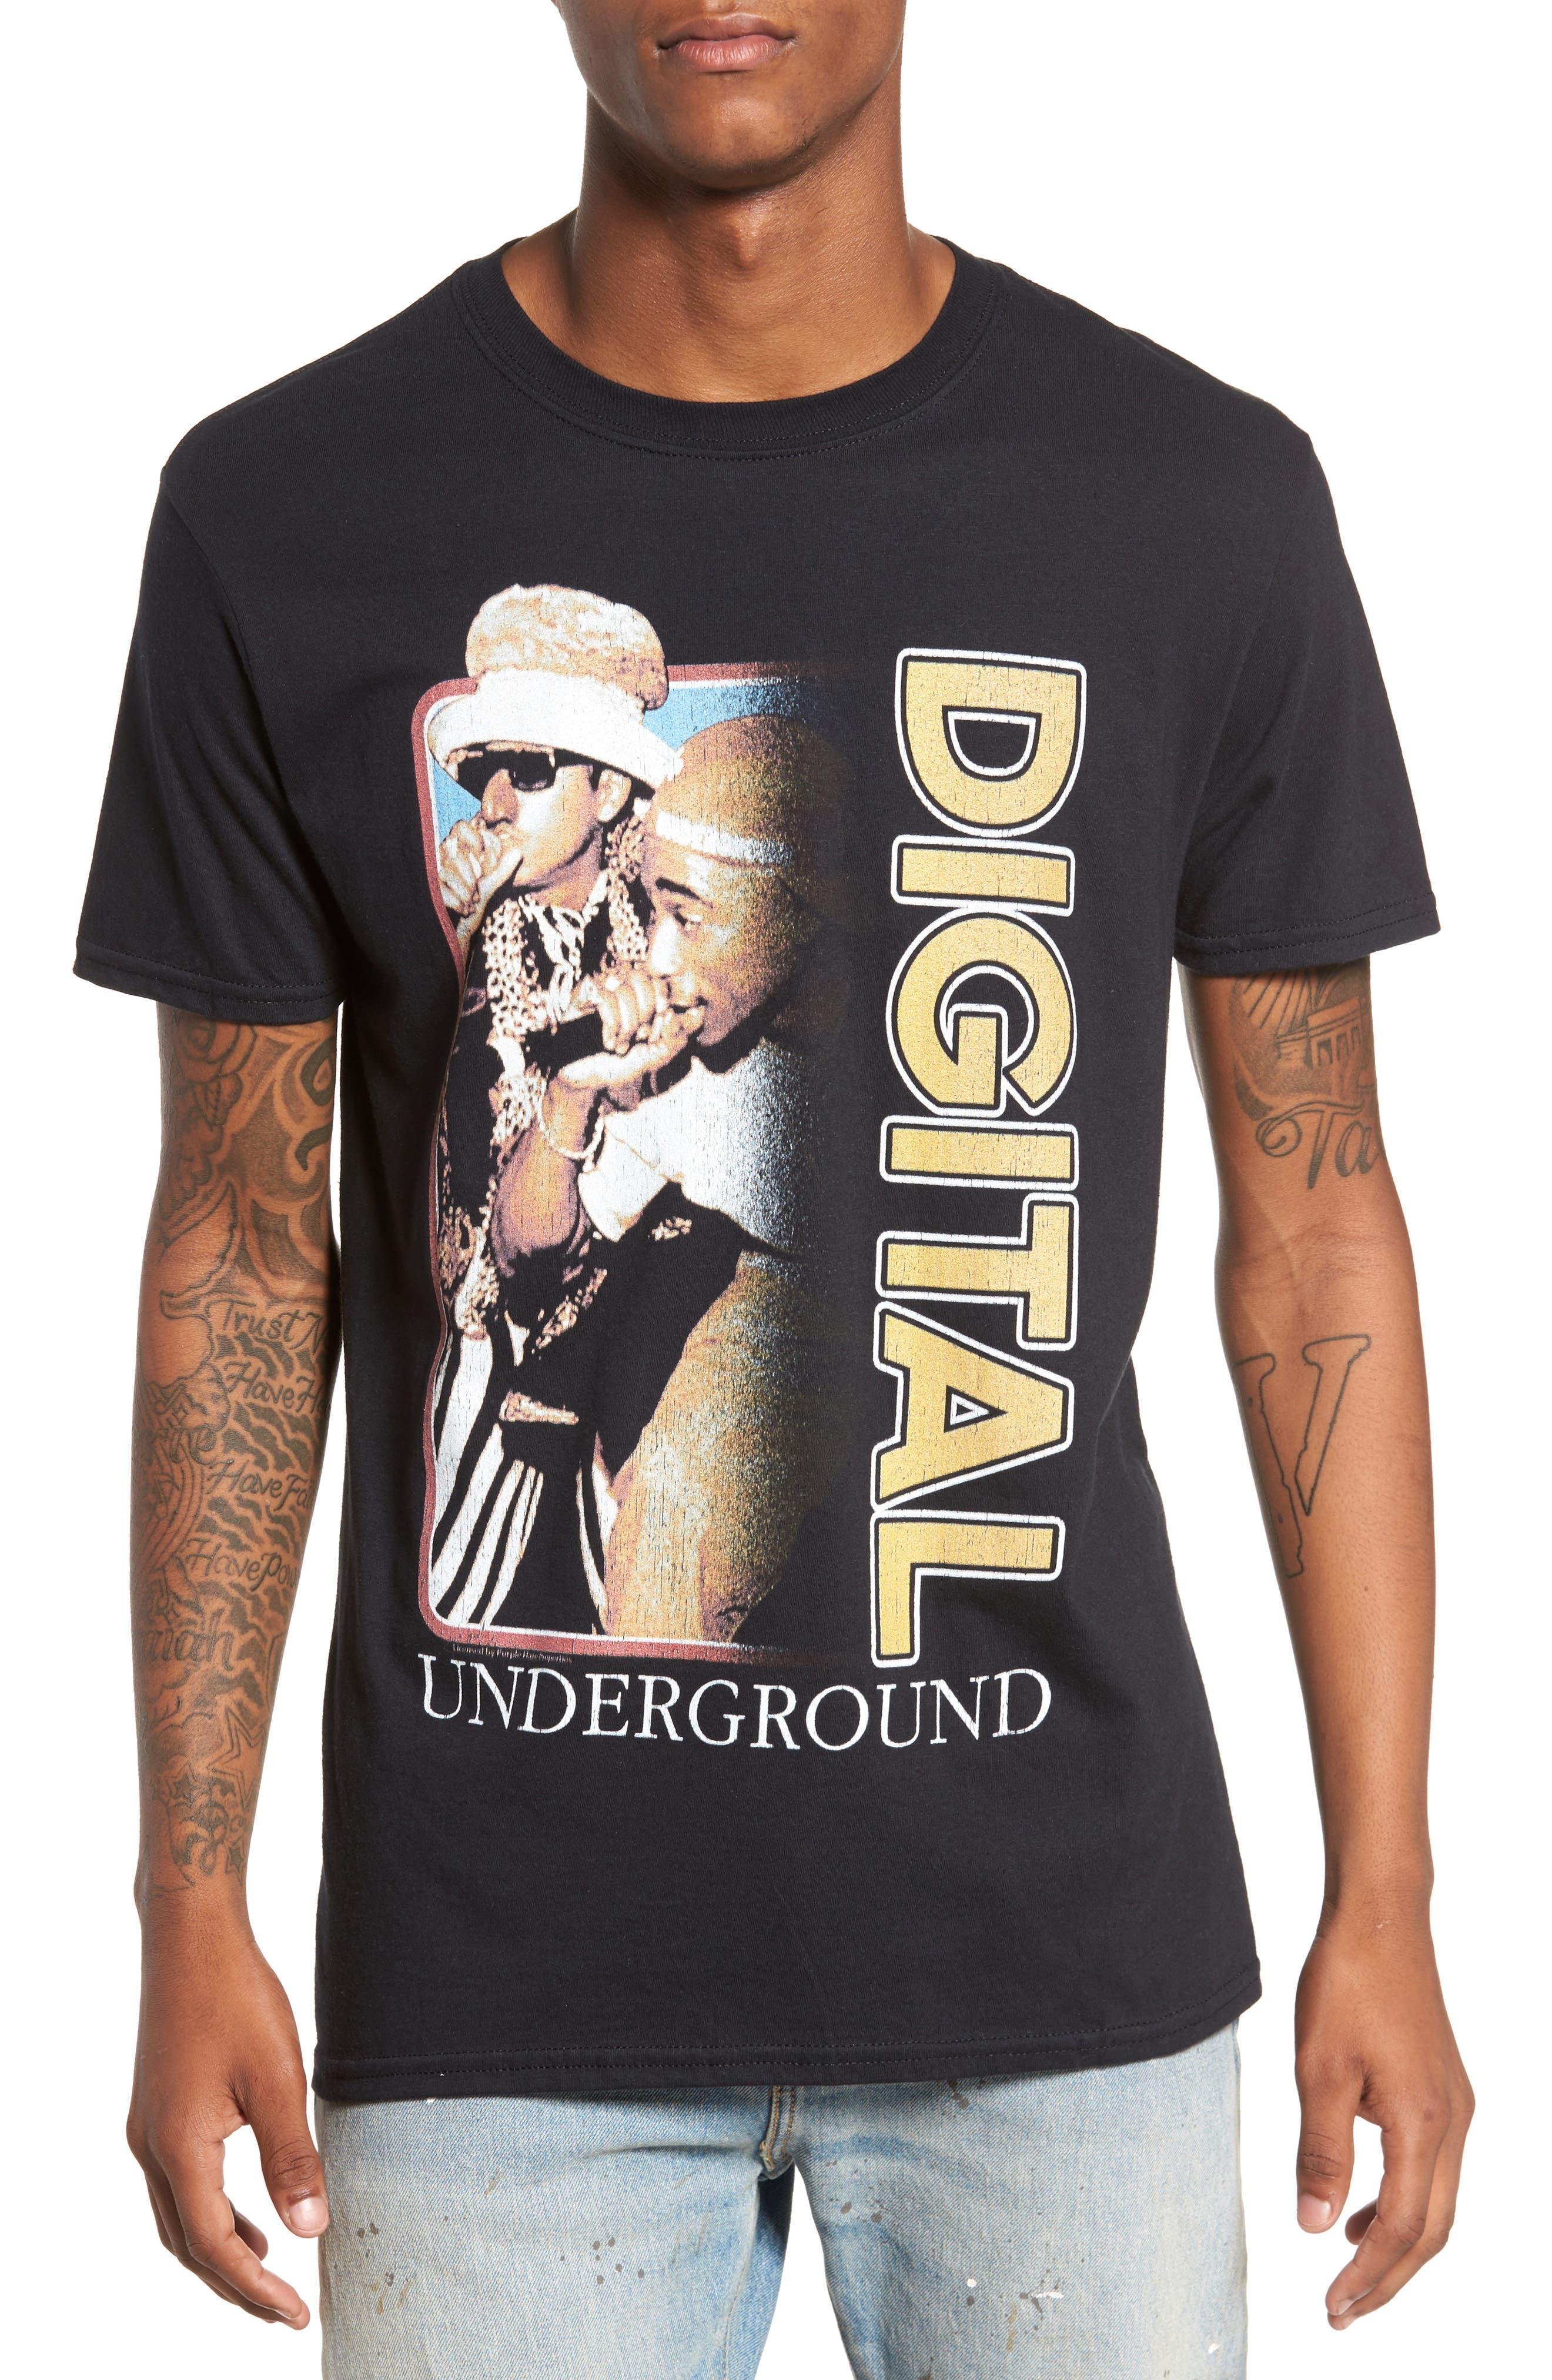 The Rail Digital Underground T-Shirt